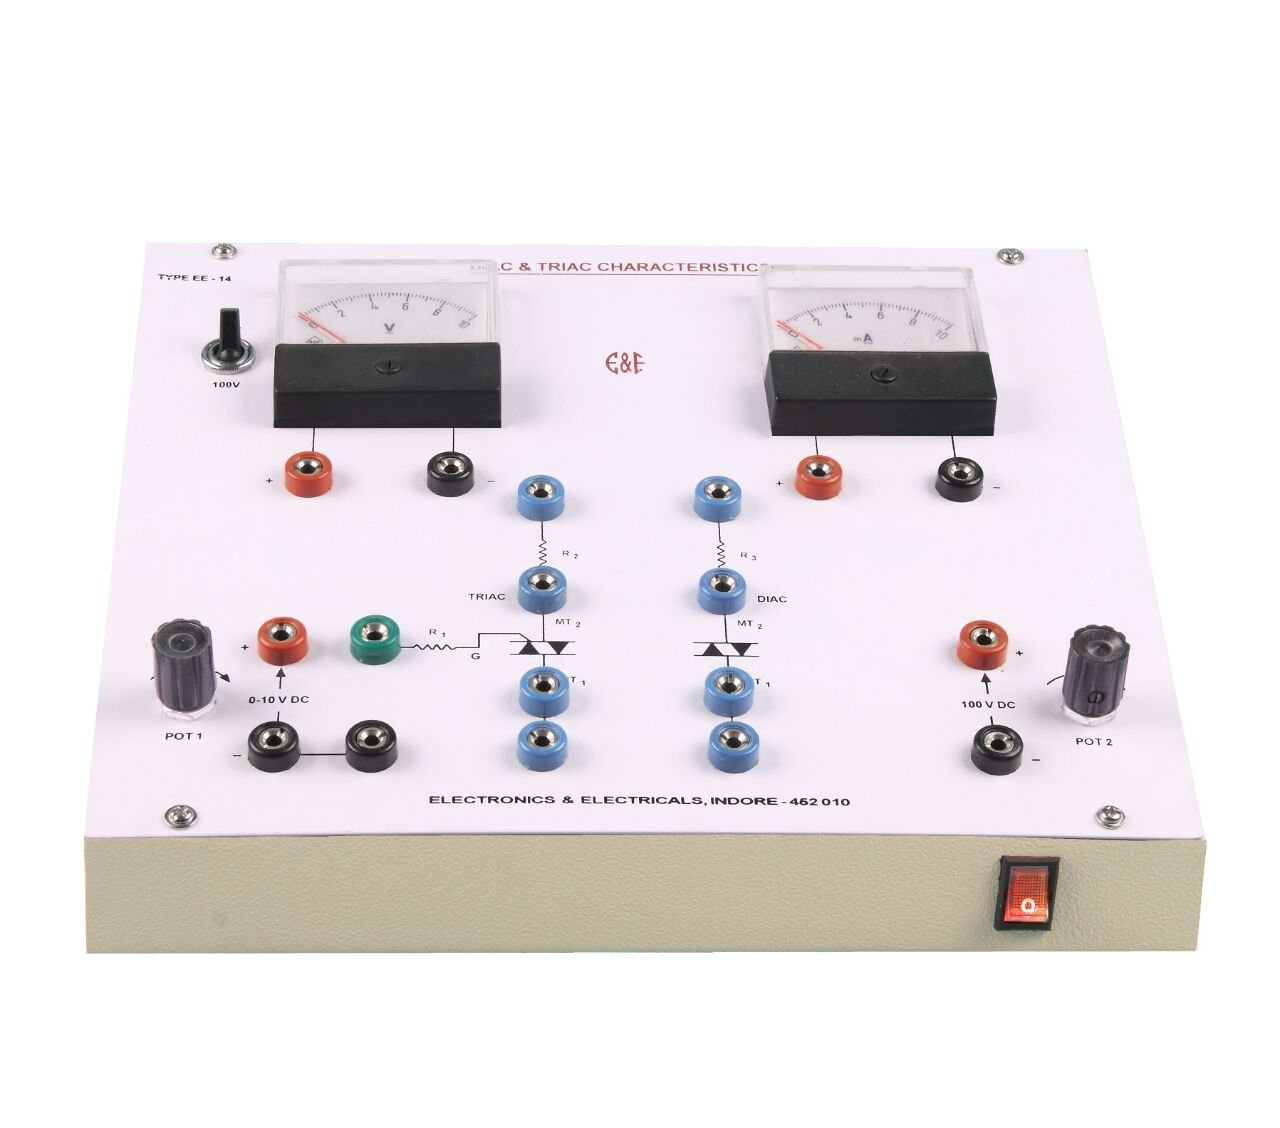 Diac And Triac Characteristic Trainer Industrial Dc Control For Triacs Scientific